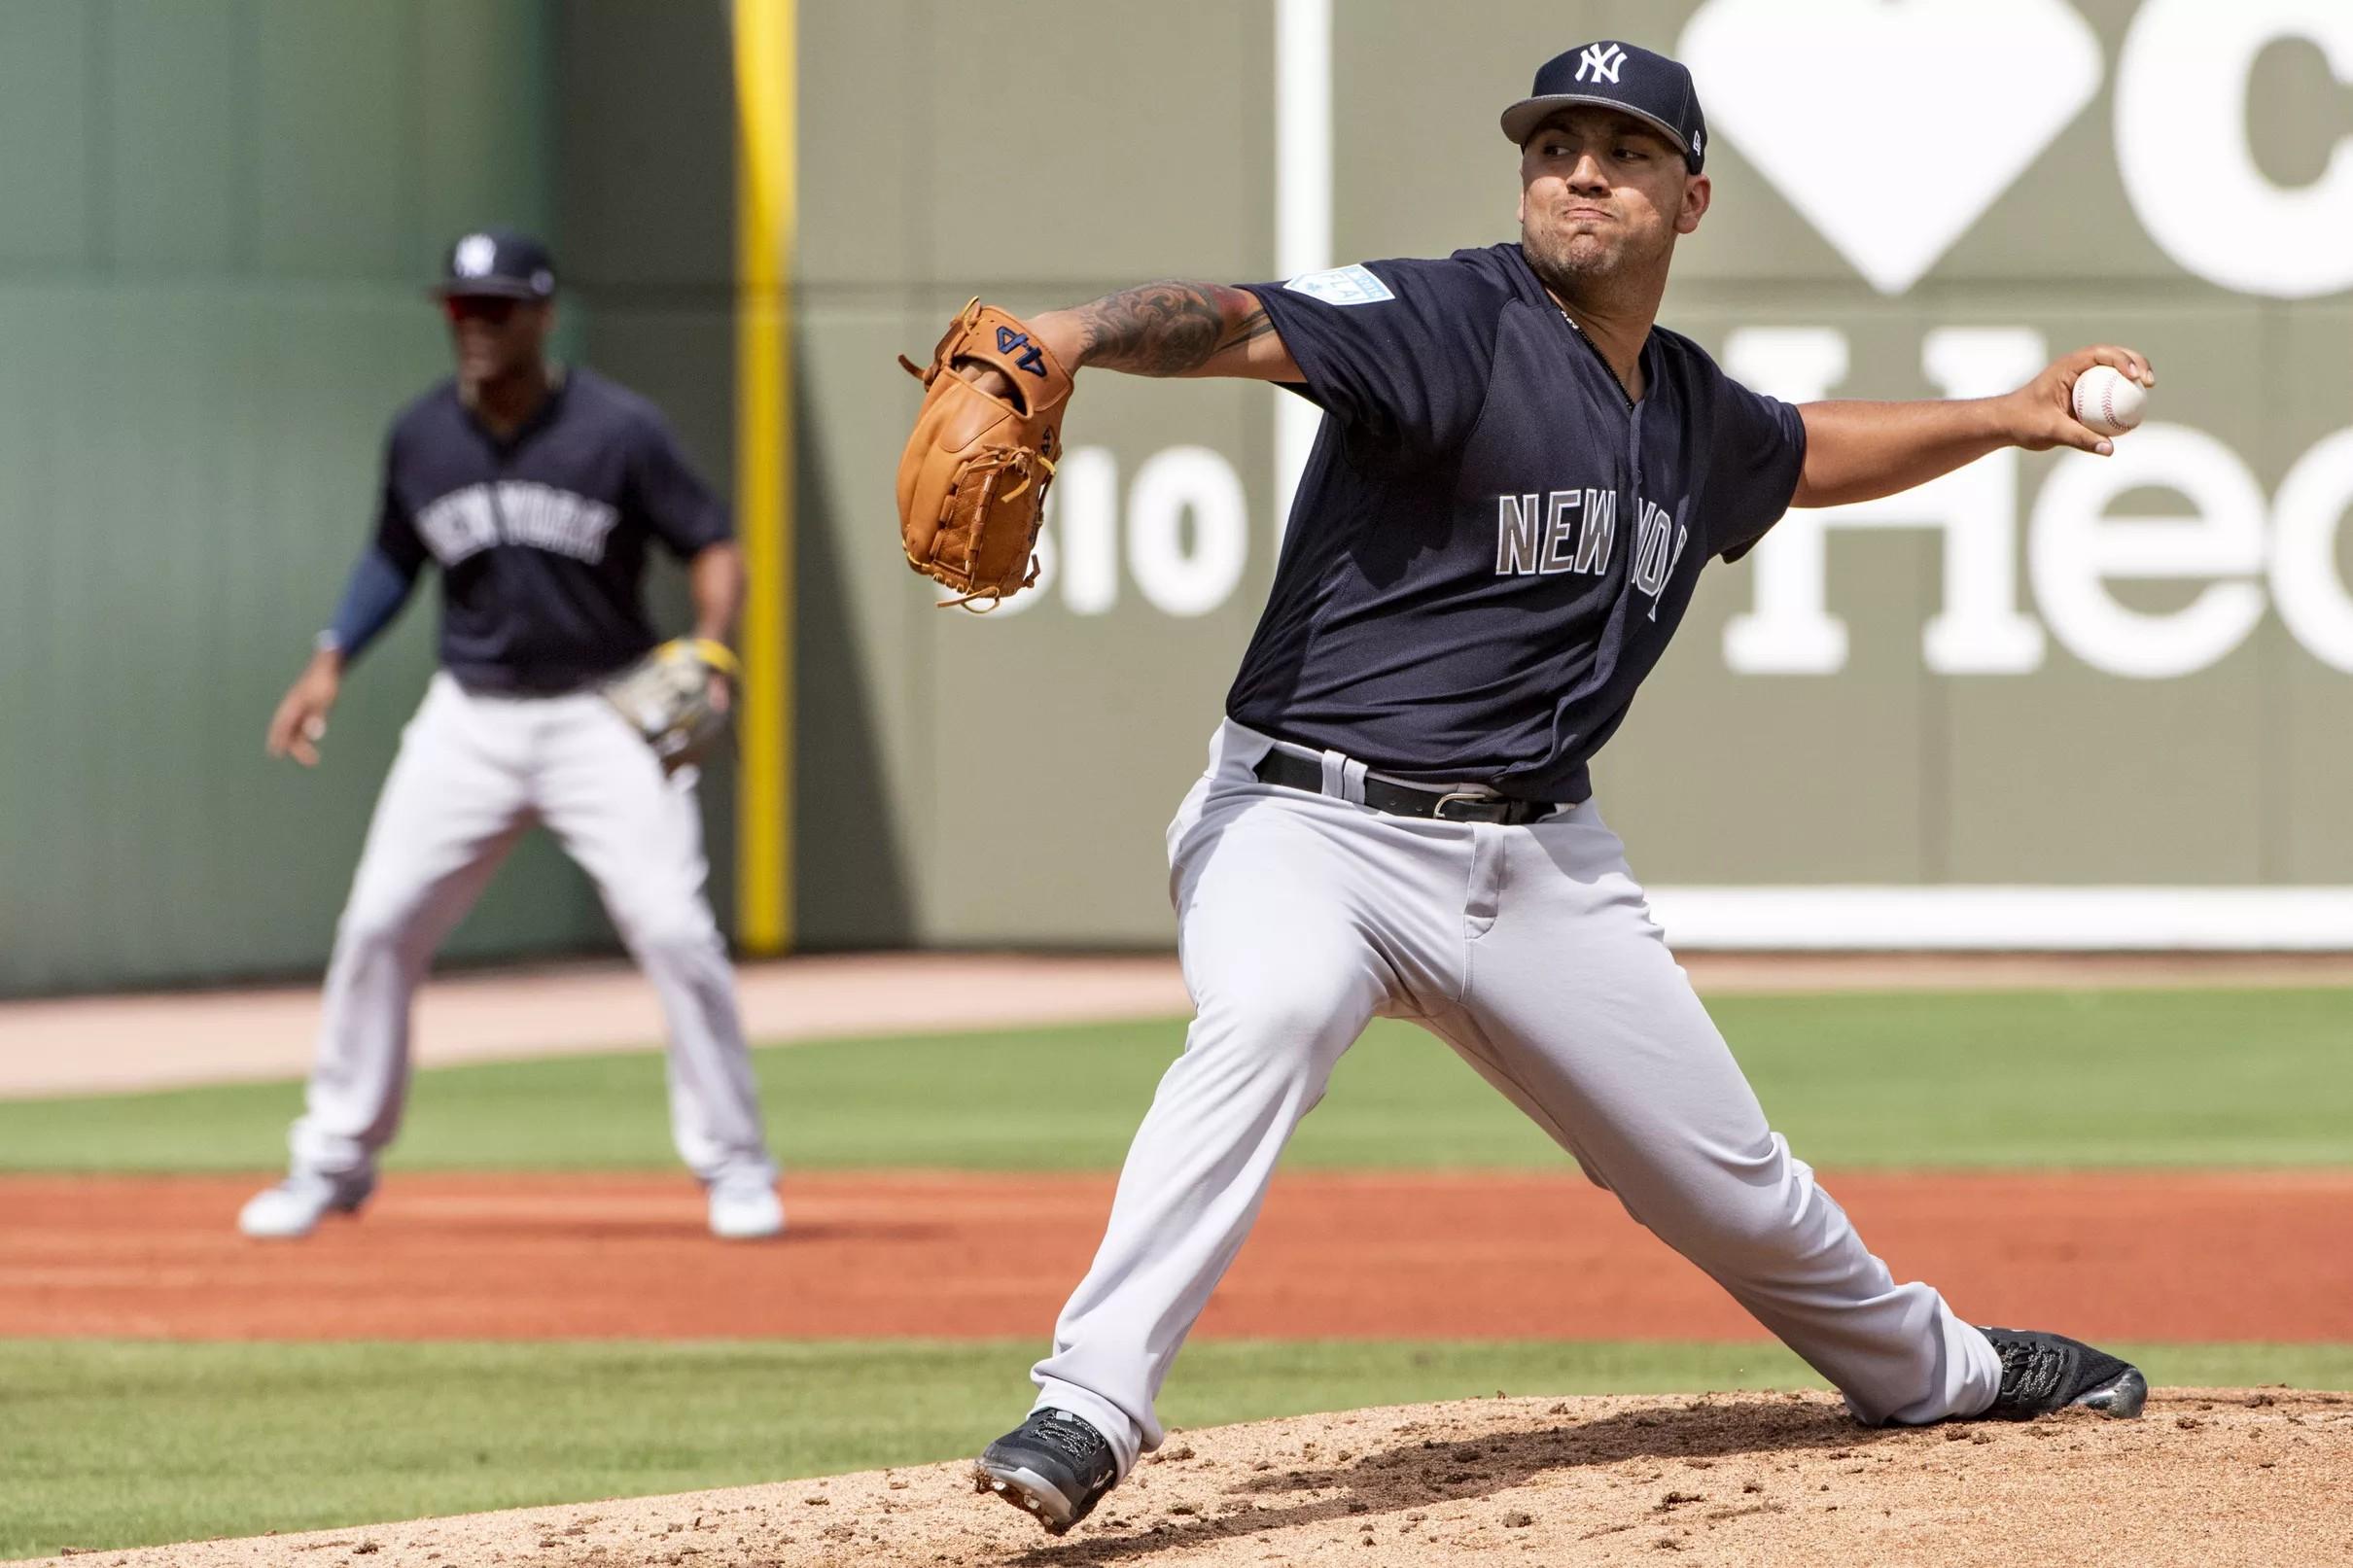 f1dbe24104a2b Yankees call up Nestor Cortes